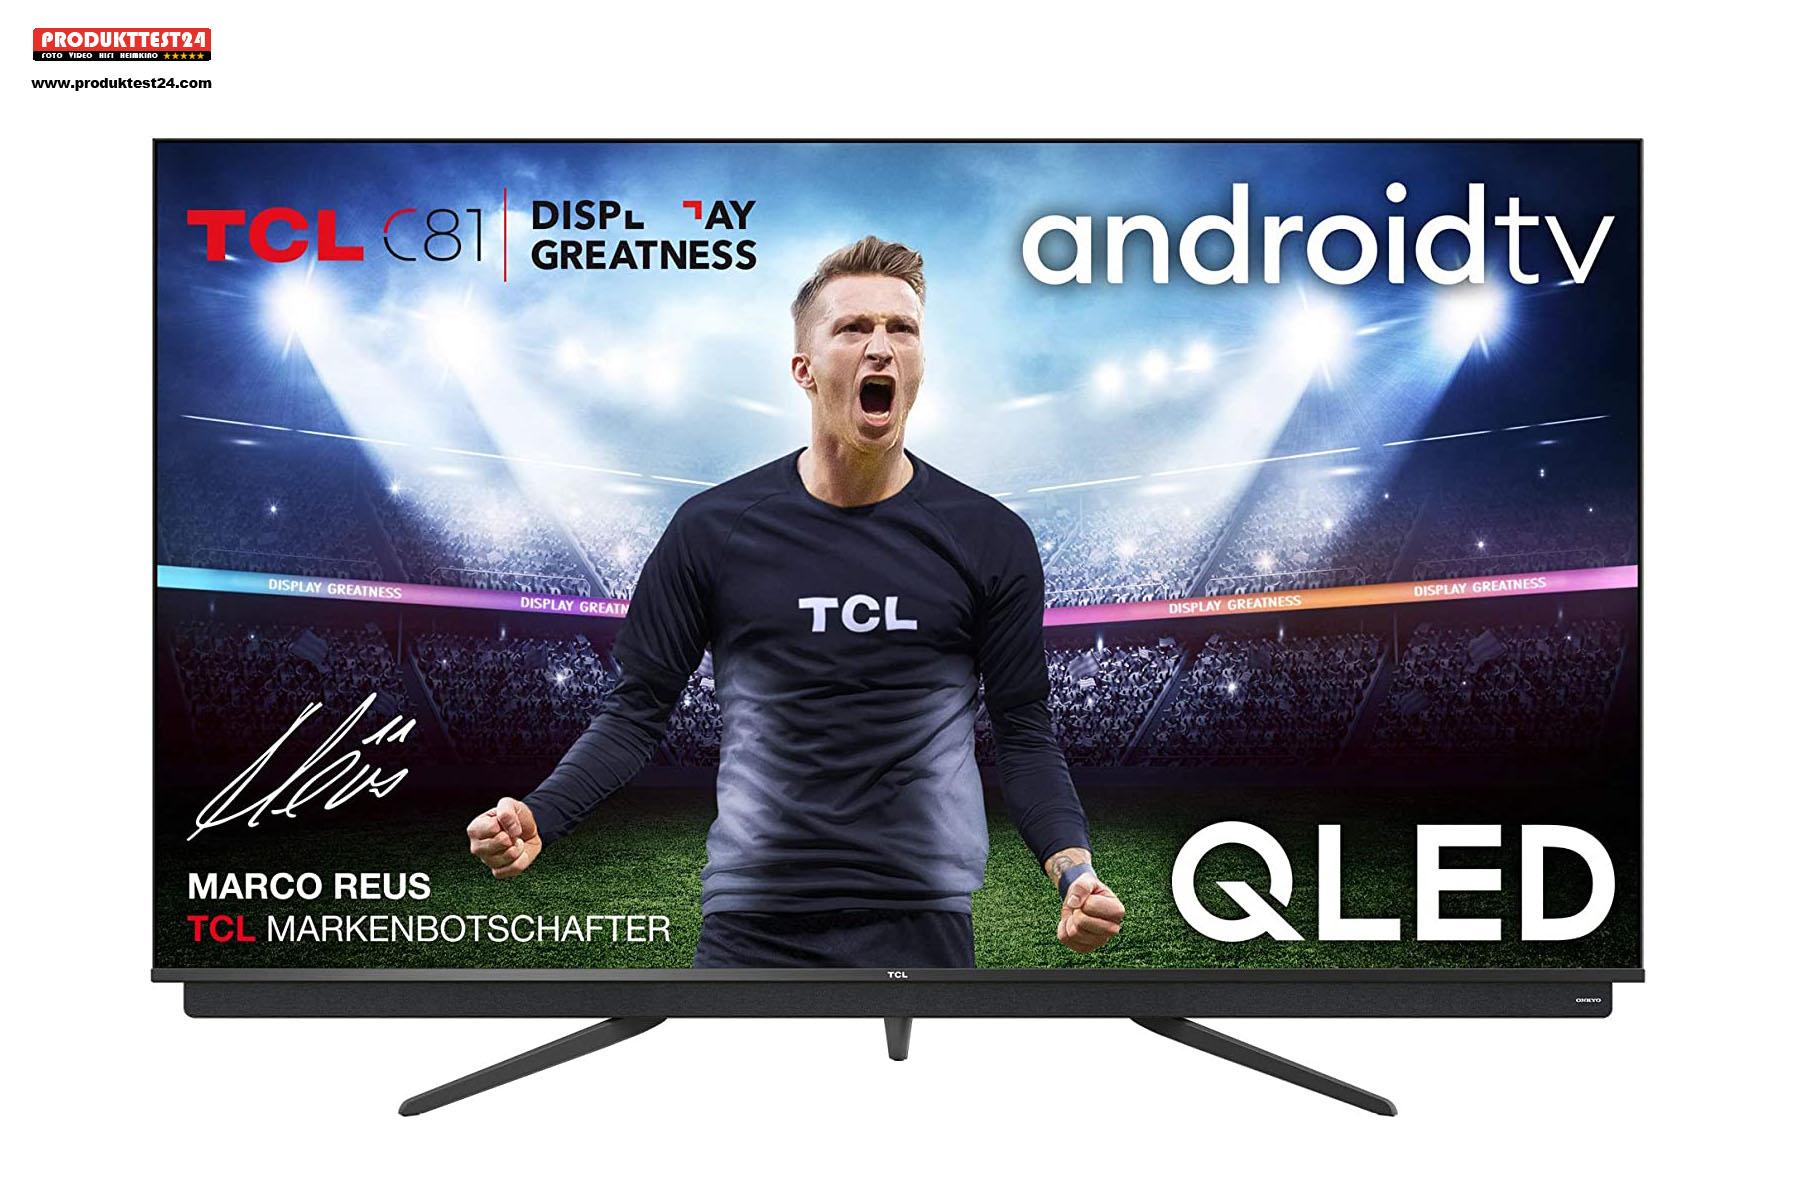 Der TCL 65C815 - 65 Zoll Bilddiagonale QLED 4K-Display mit HDR1ß und Dolby Vision